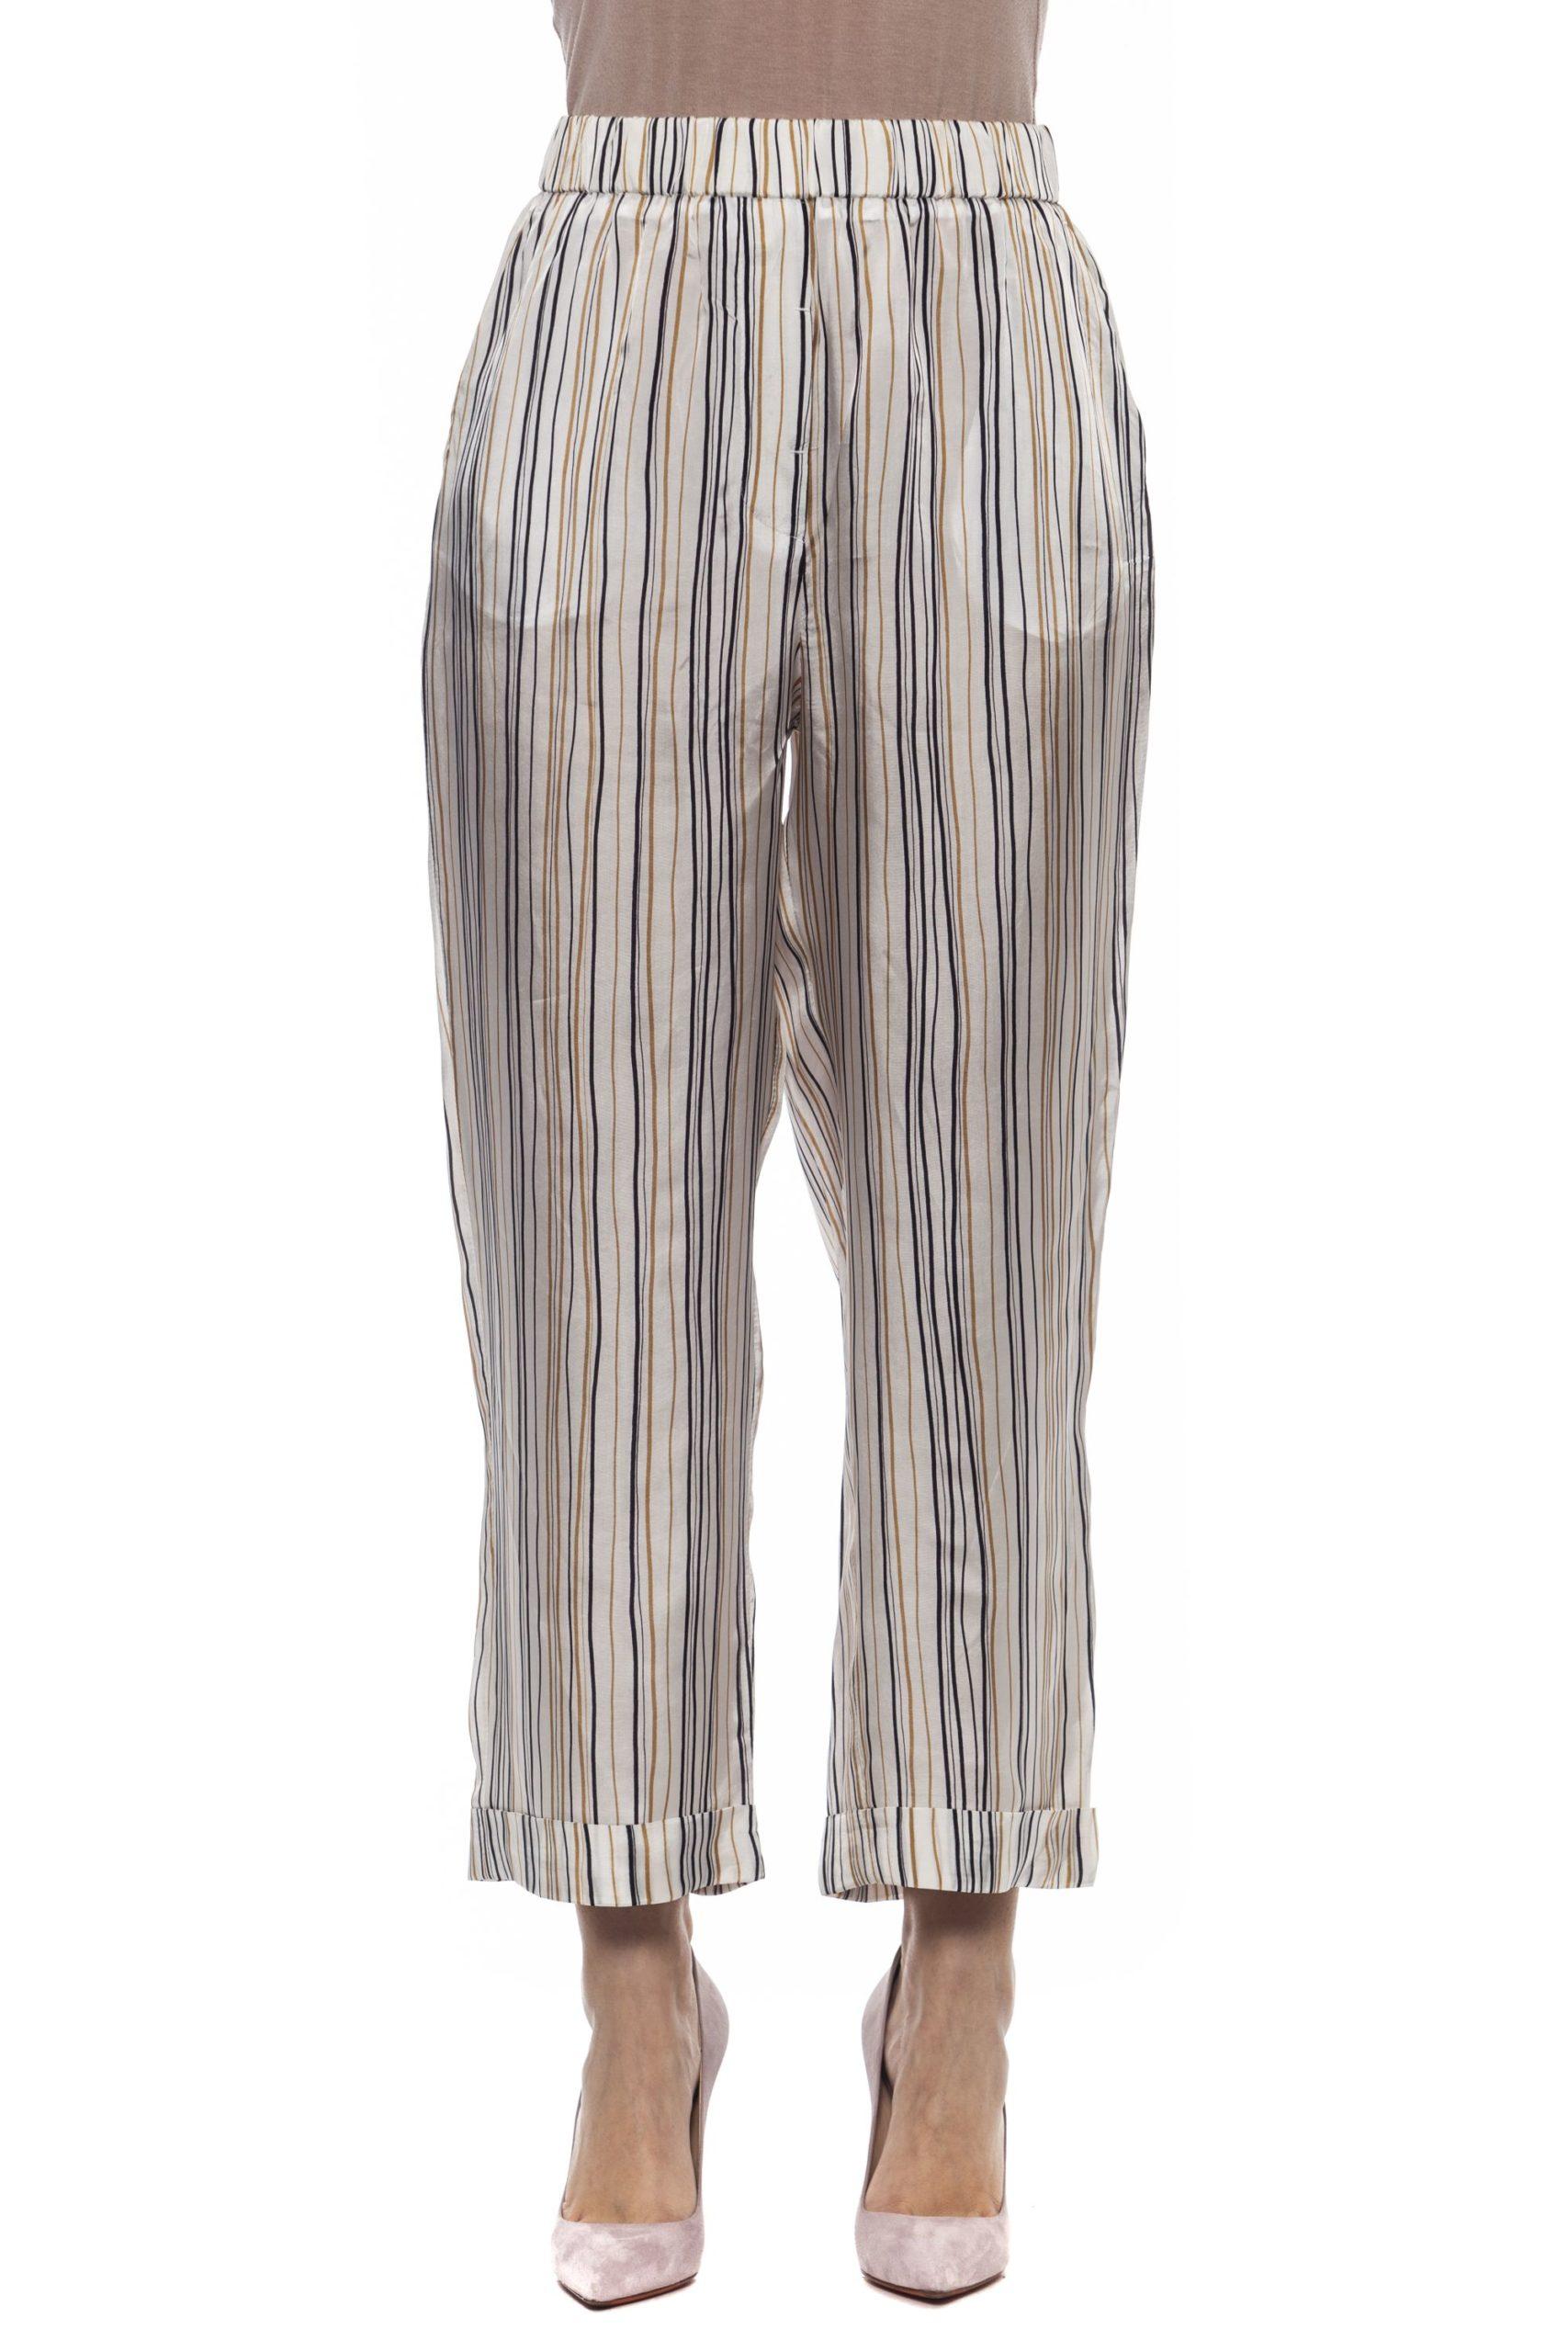 Giallo Yellow Jeans & Pant - IT42 | S